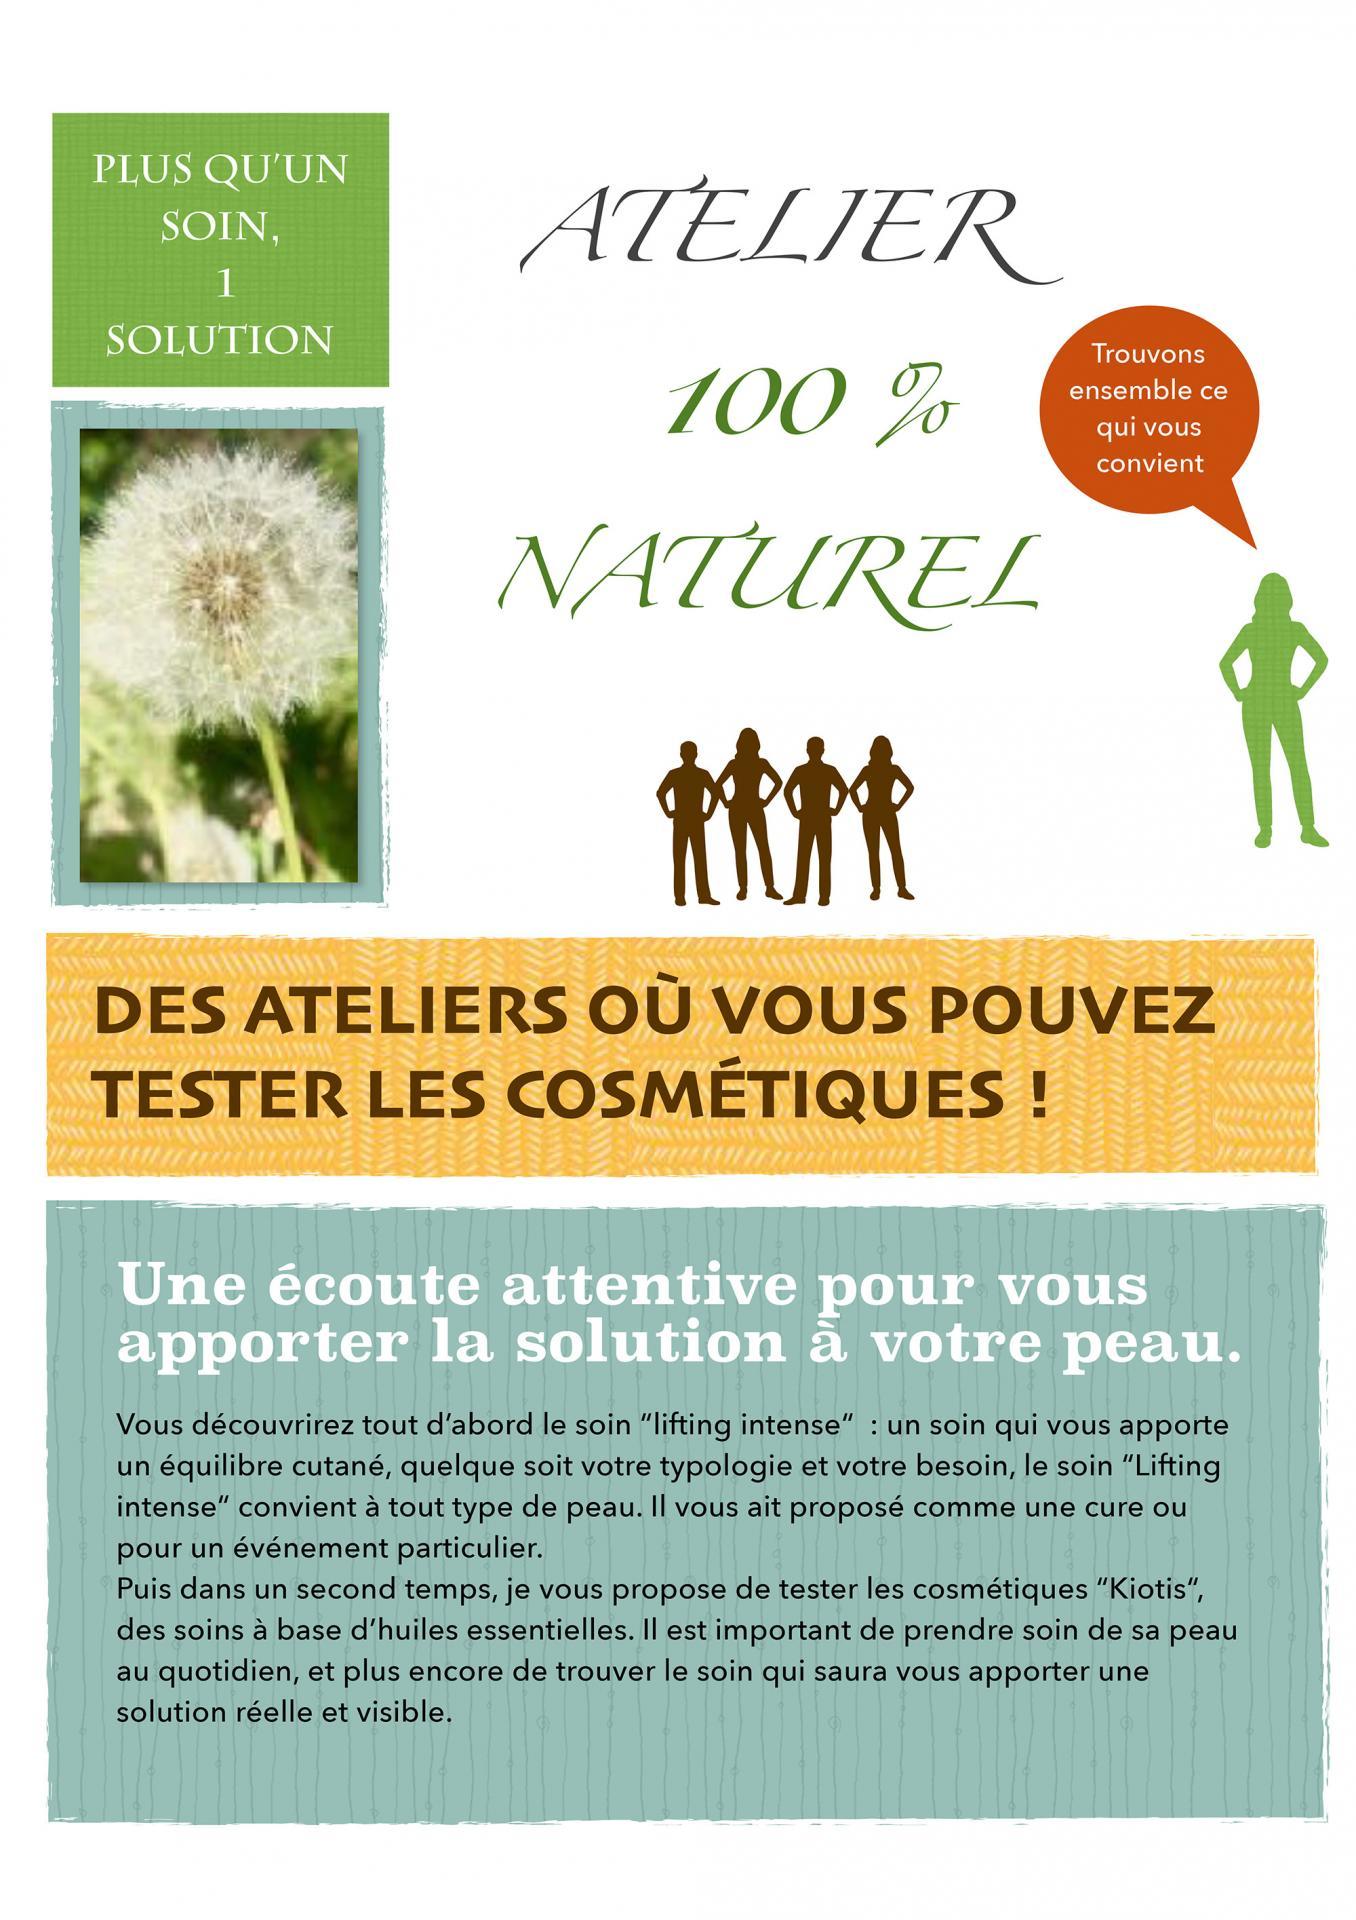 Atelier 100 naturel new 1